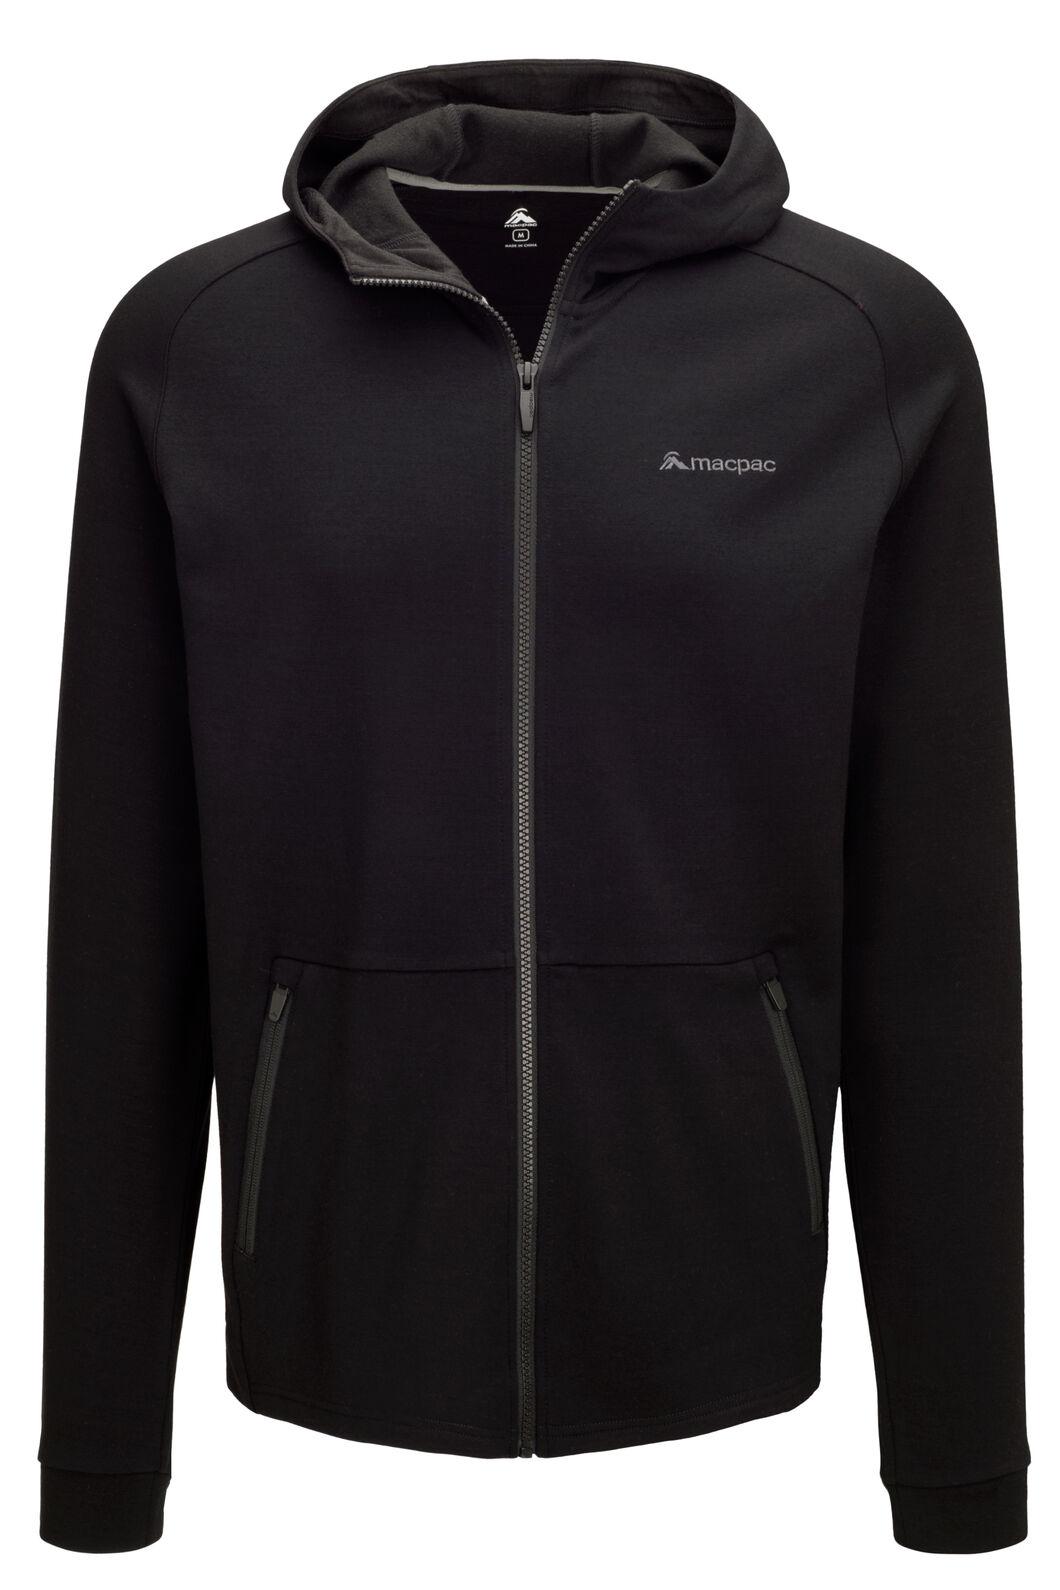 Macpac Men's Craigieburn 280 Merino Blend Hooded Jacket, Black, hi-res